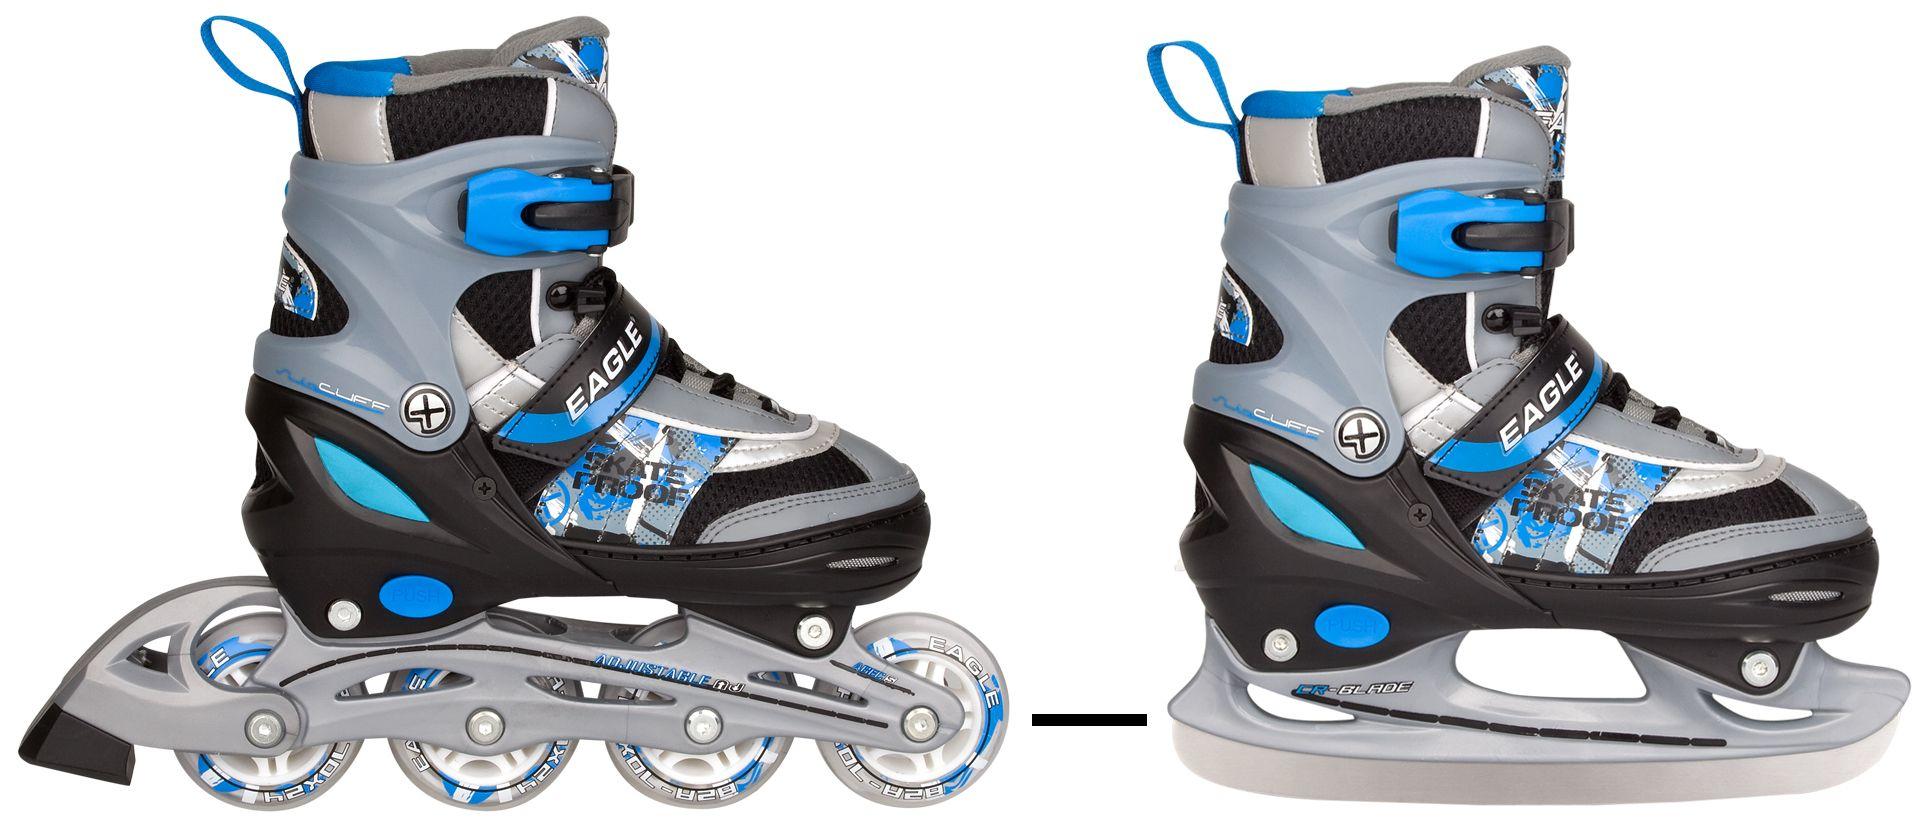 d7ebf6c234a Skates/schaats Combo kleur = zwart/zilver/blauw van BK-Sport Winter